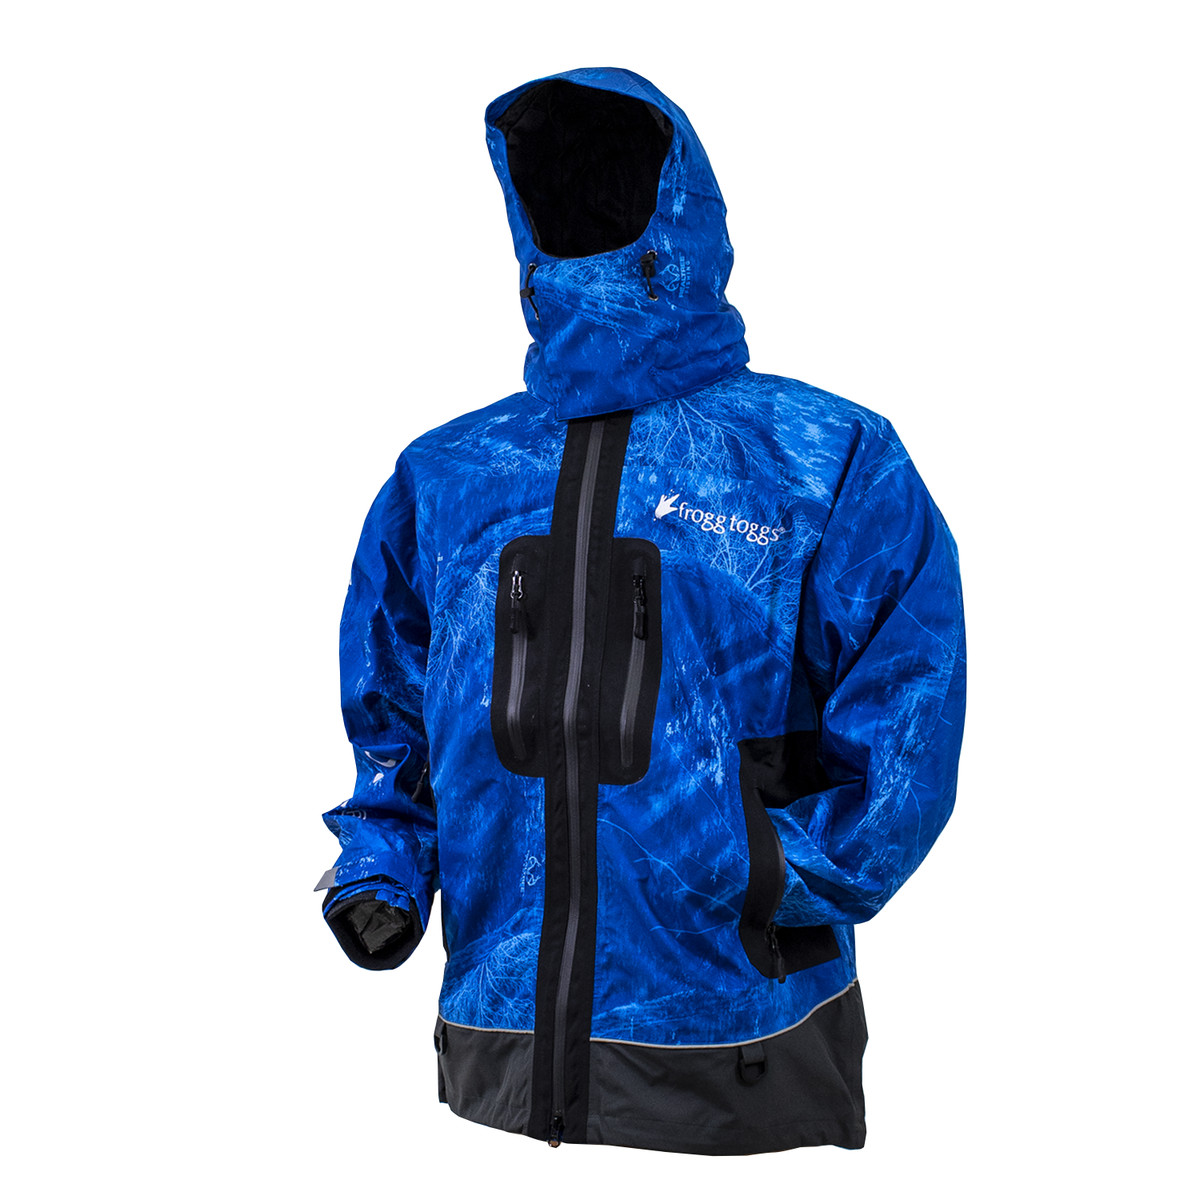 Limited Edition Pilot Pro Jacket | REALTREE FISHING DARK BLUE